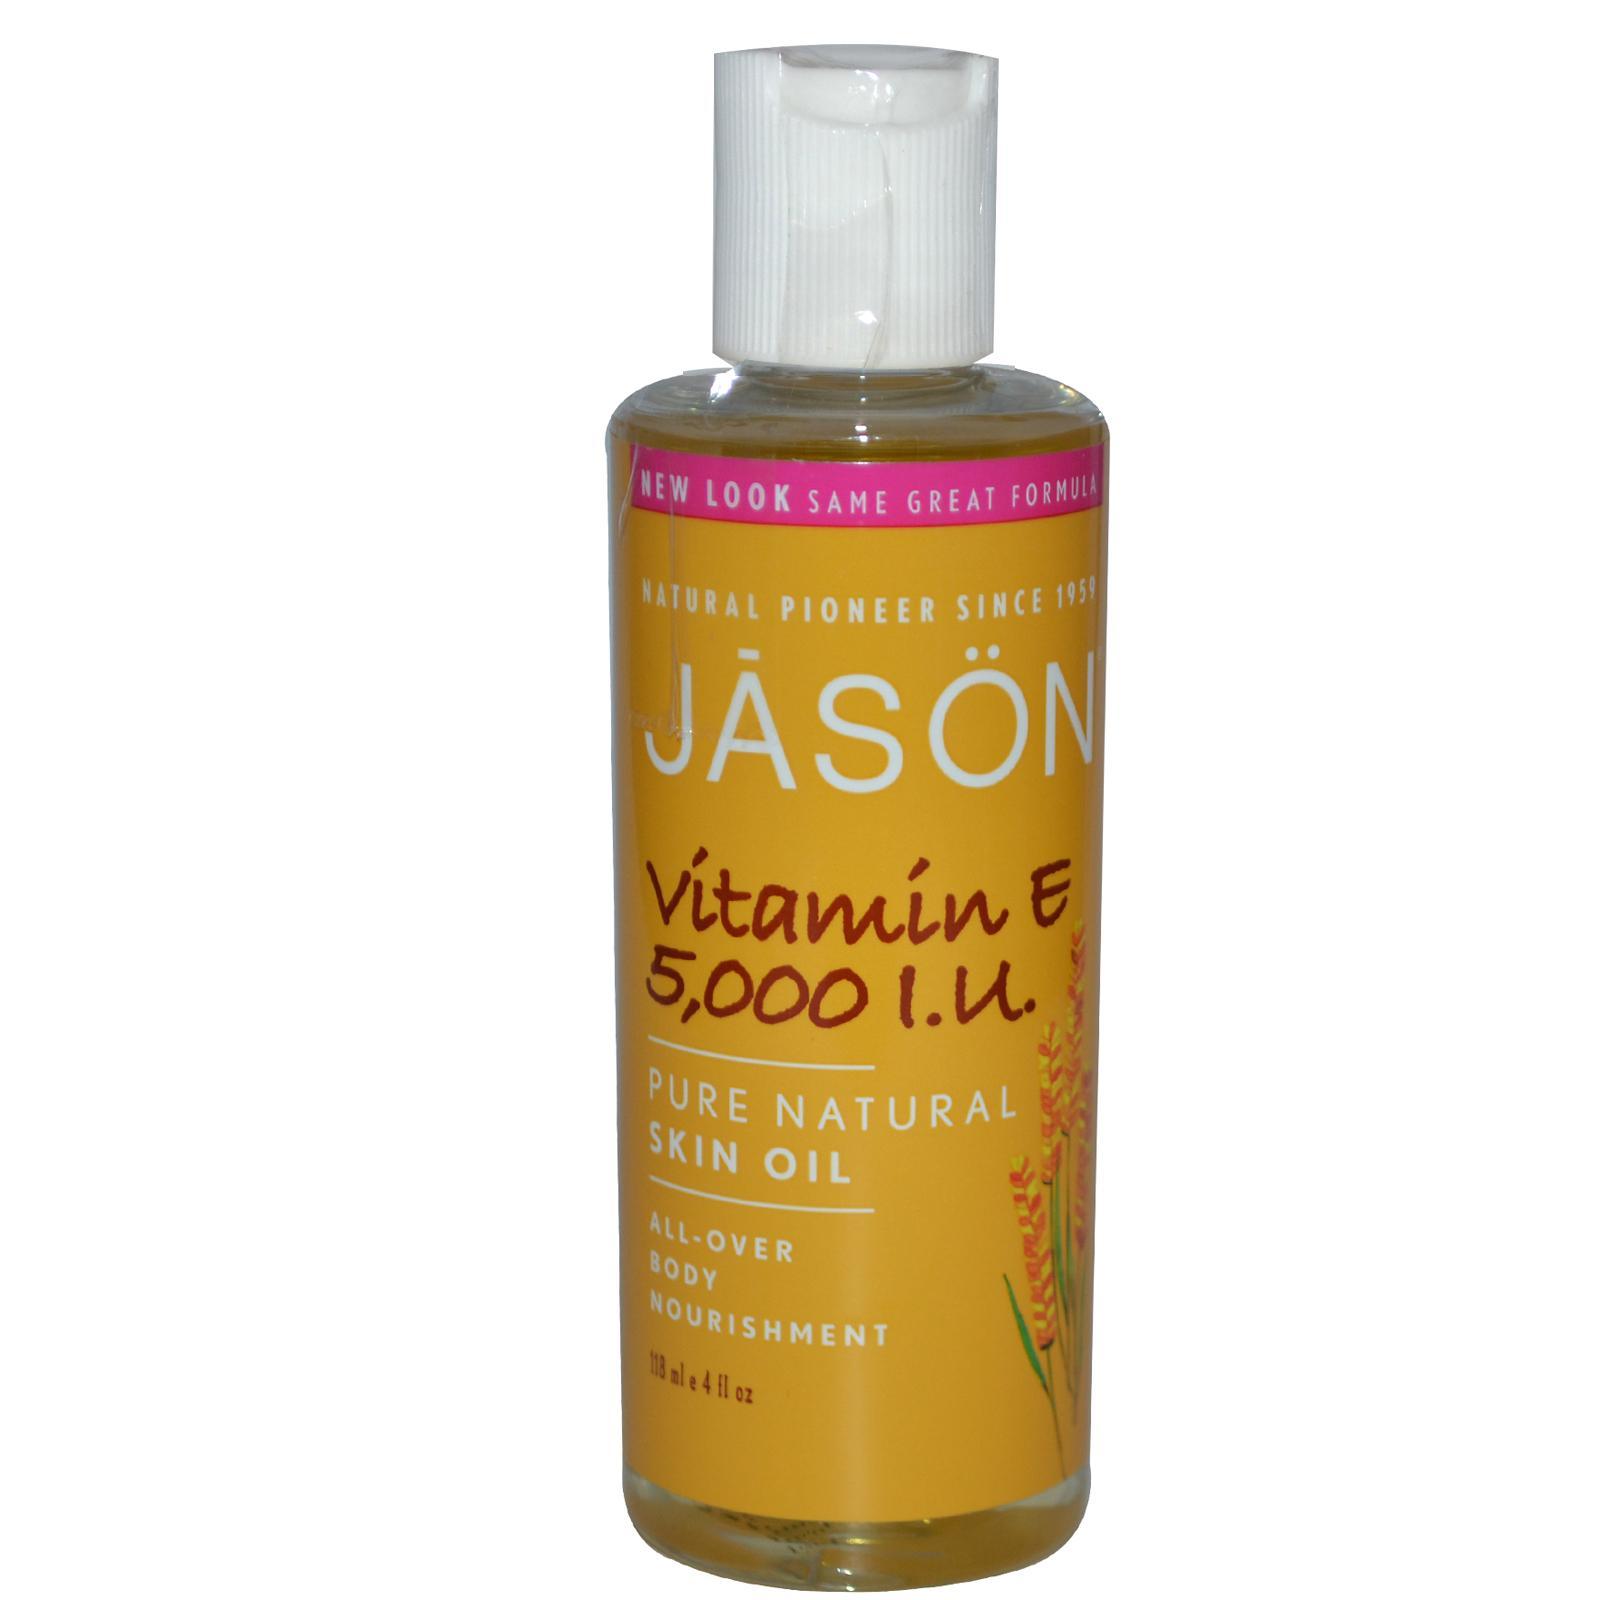 Масло Jason Natural, Vitamin E, 5,000 I.U. Pure Natural Skin Oil (118 ml)